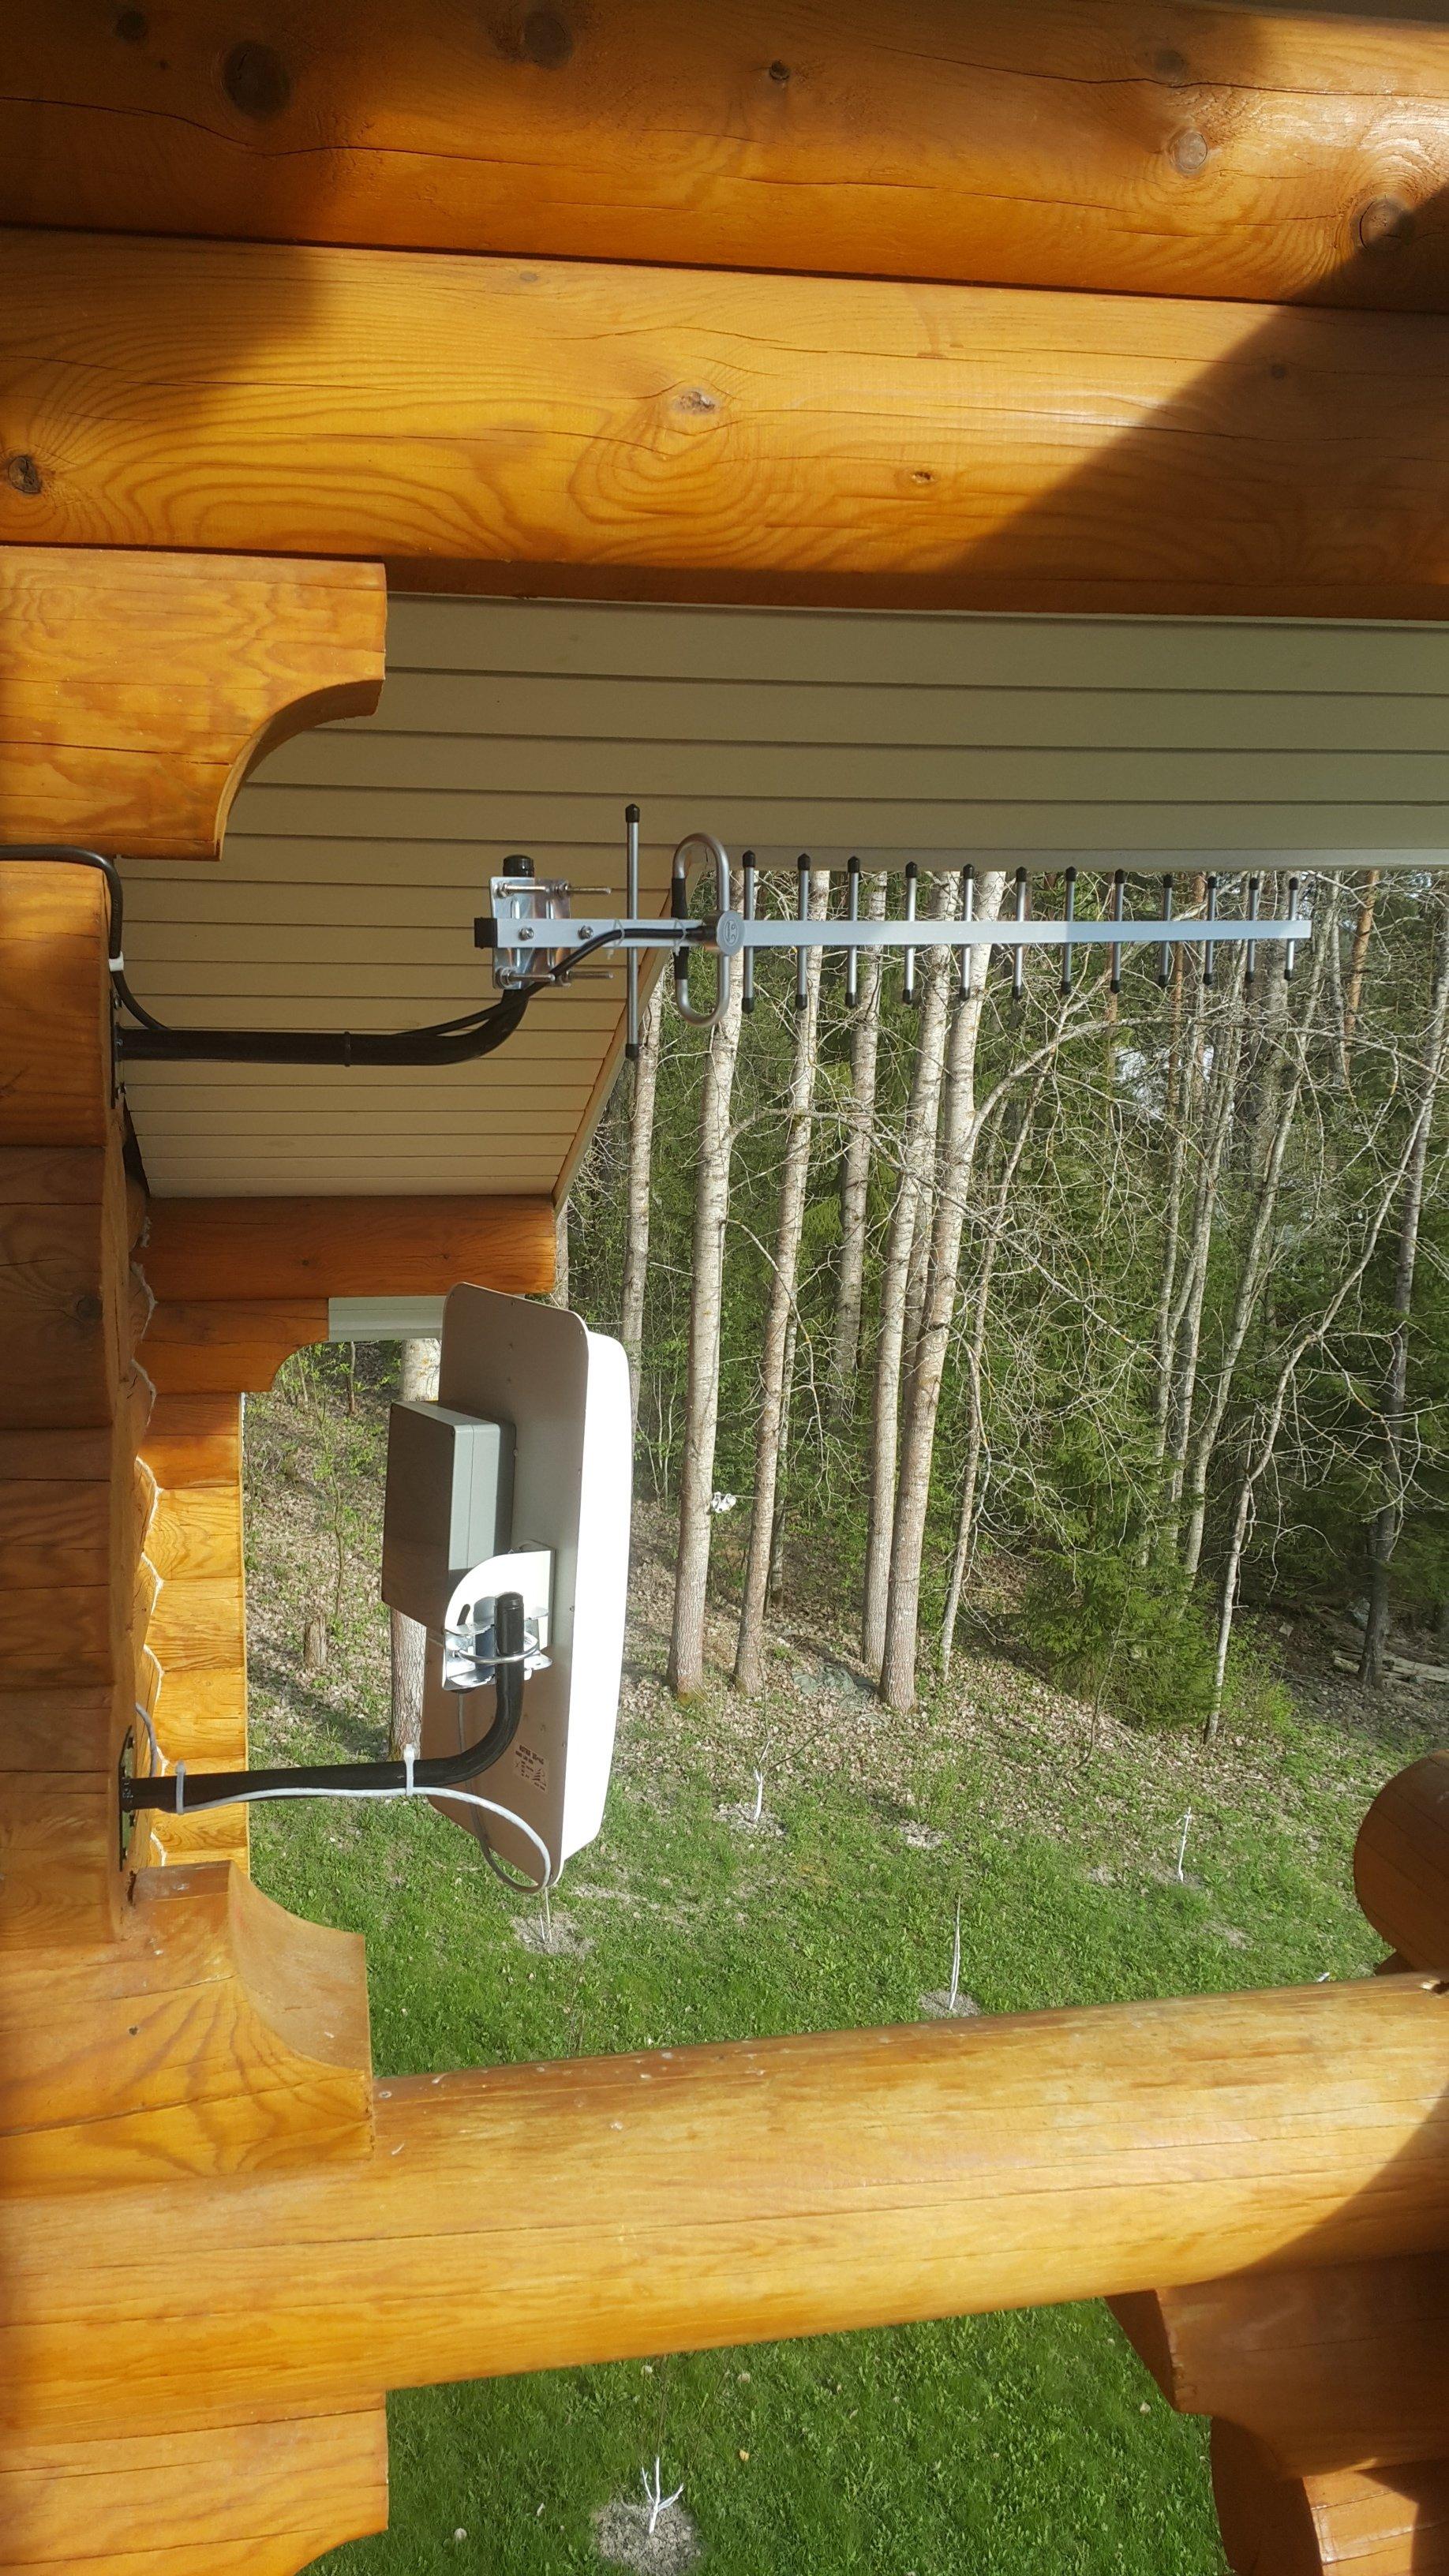 Монтаж антенны GSM 900 MediaWave MWA-9-Y18 на стене деревянного бруса